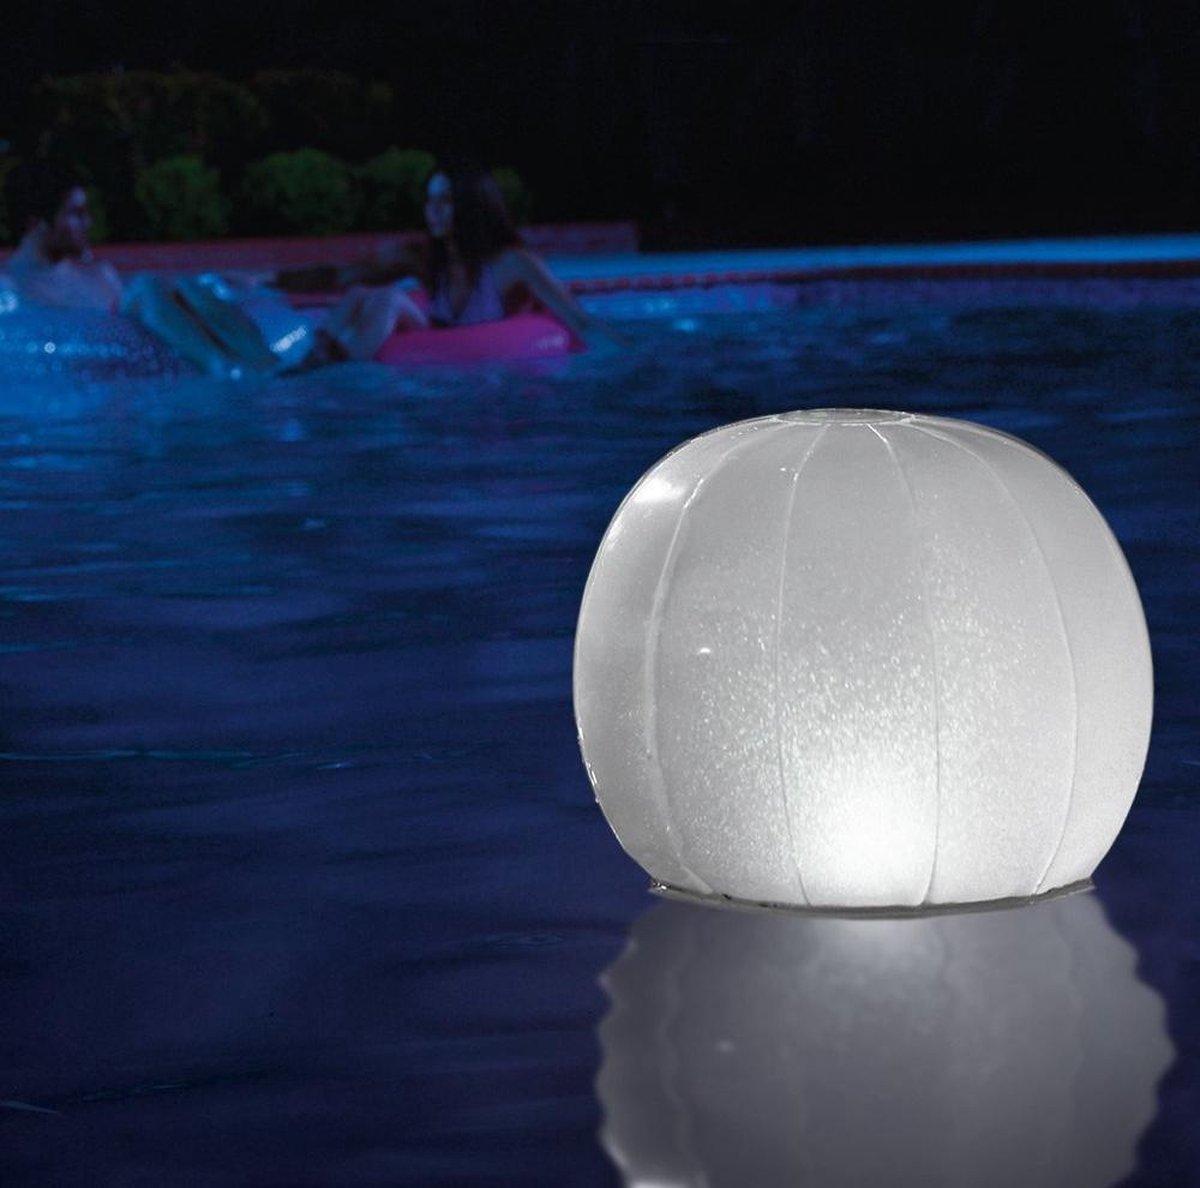 Drijvende led lichtbal / Floating led ball 23cm x 22cm - Intex